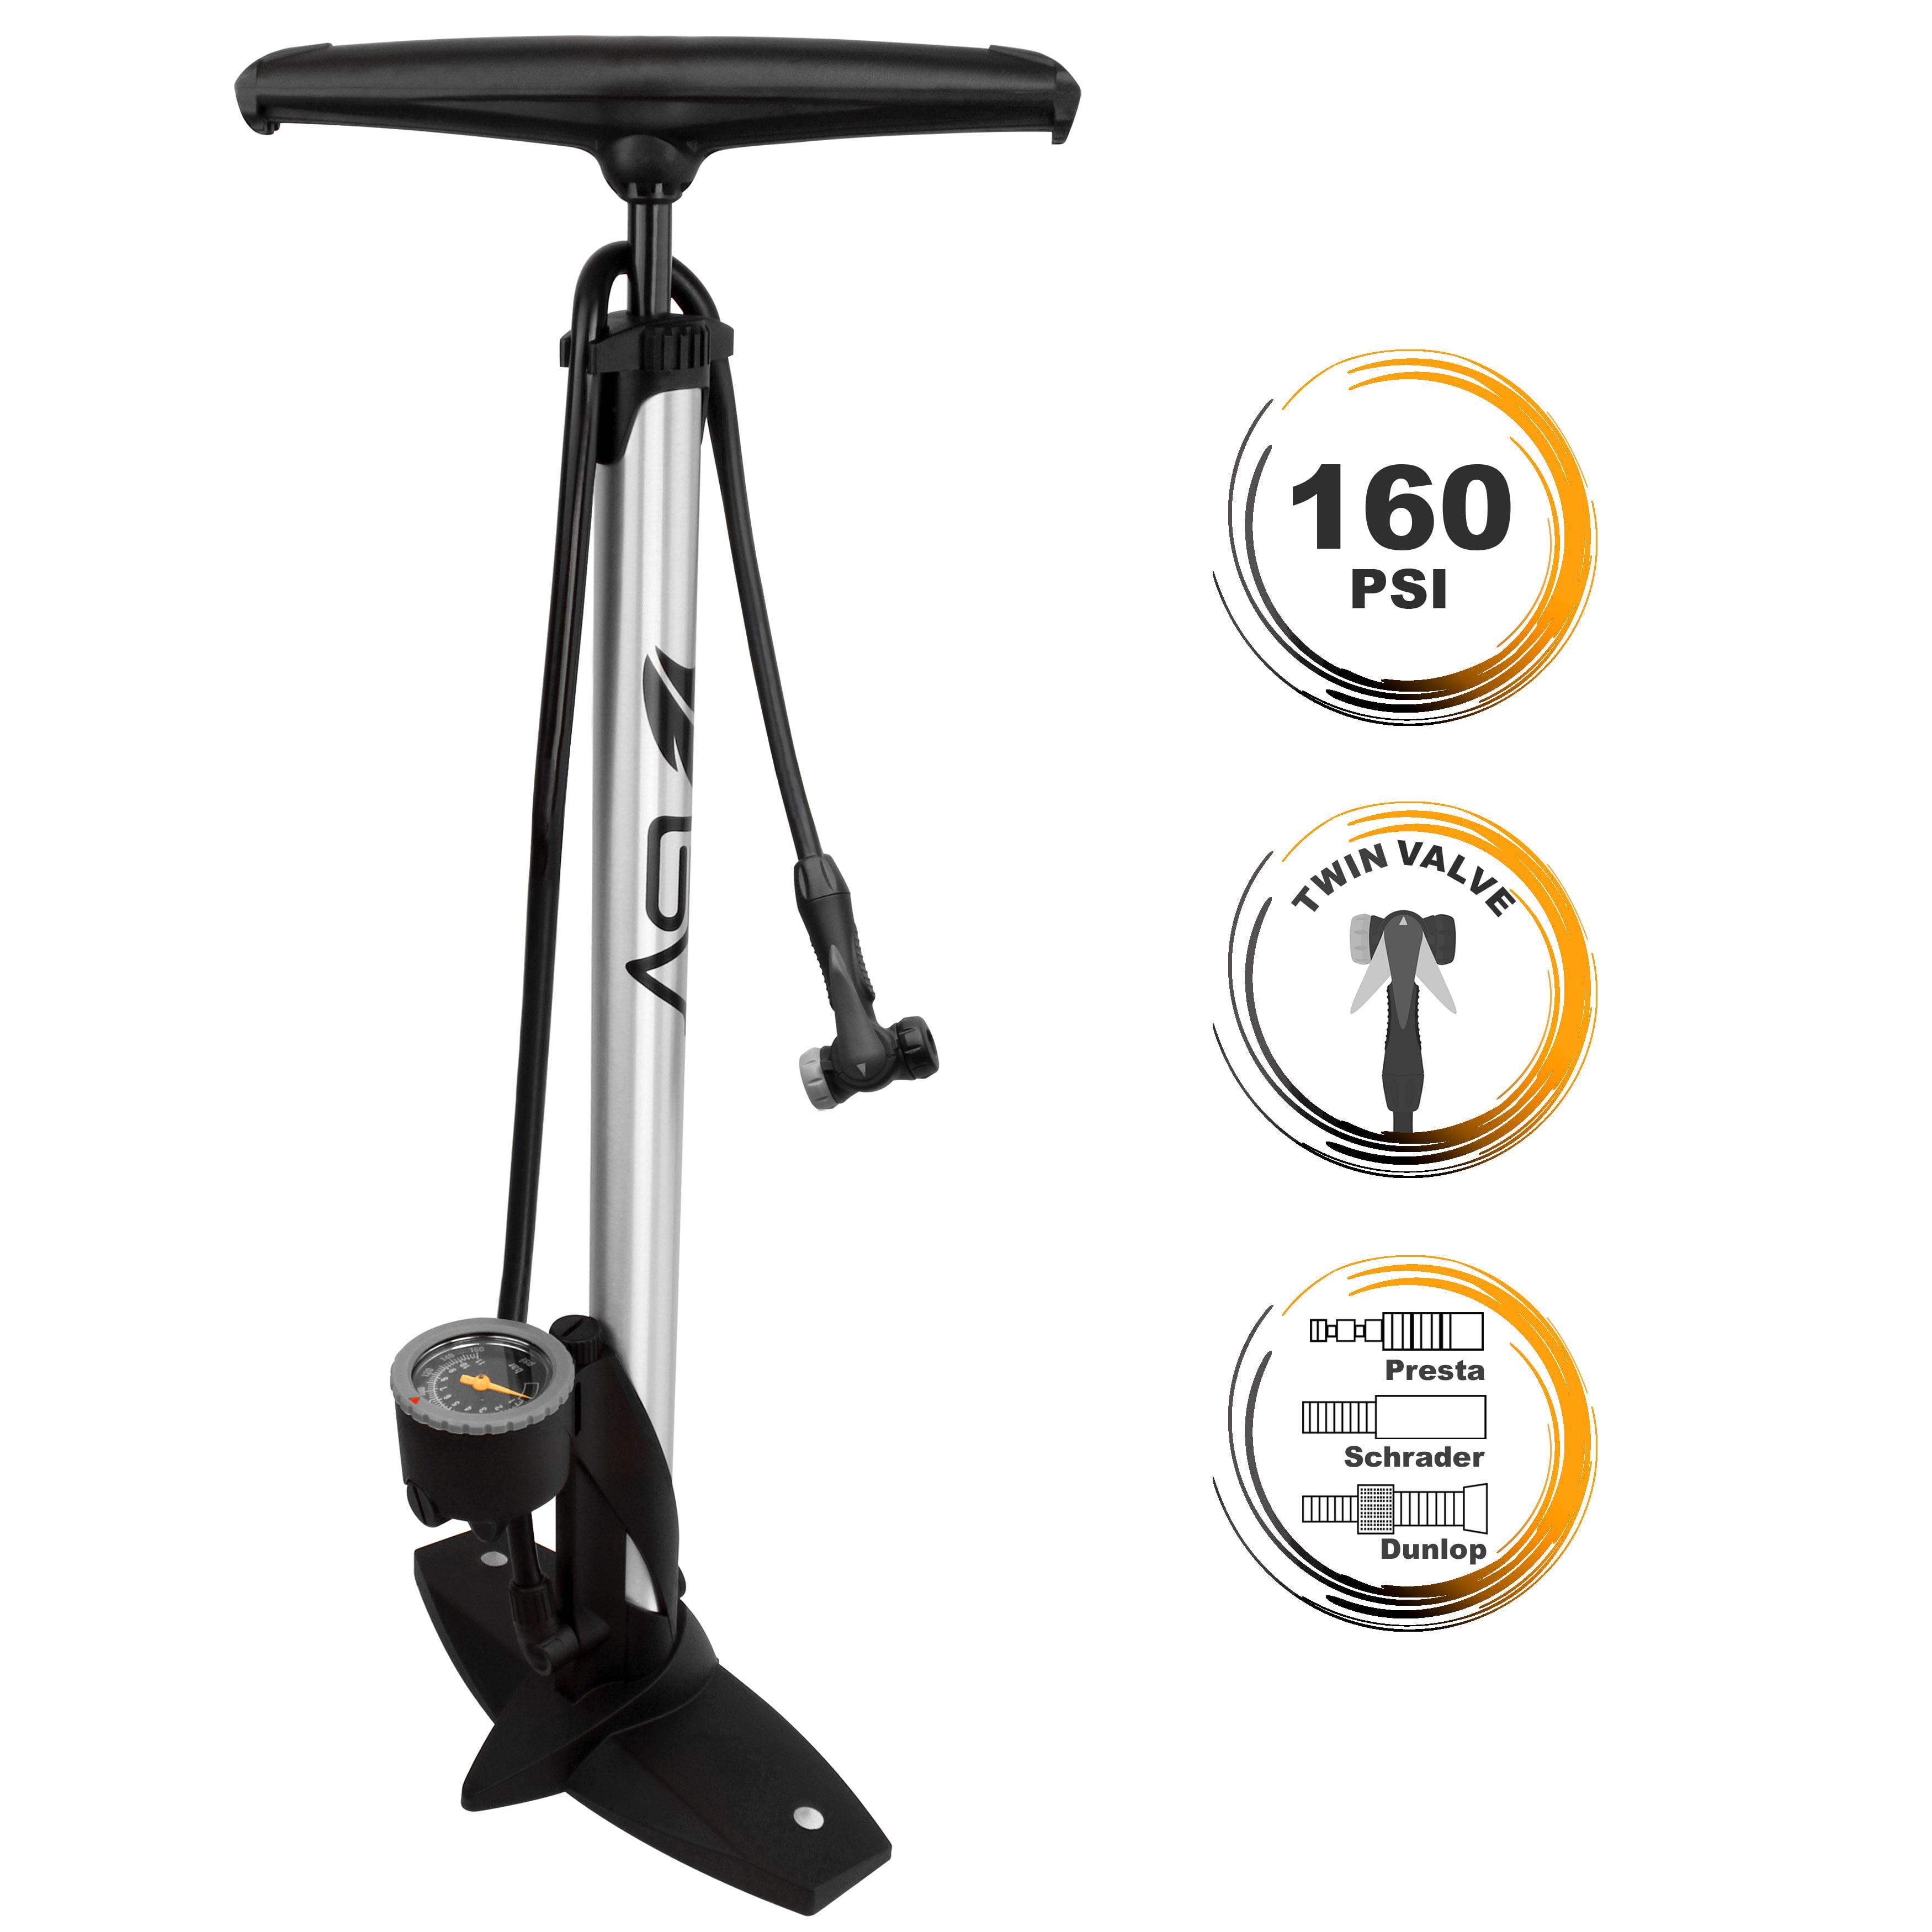 Bicycle Ergonomic Floor Pump W Gauge /& Clever Air Valve 160 Psi Reversible Prest